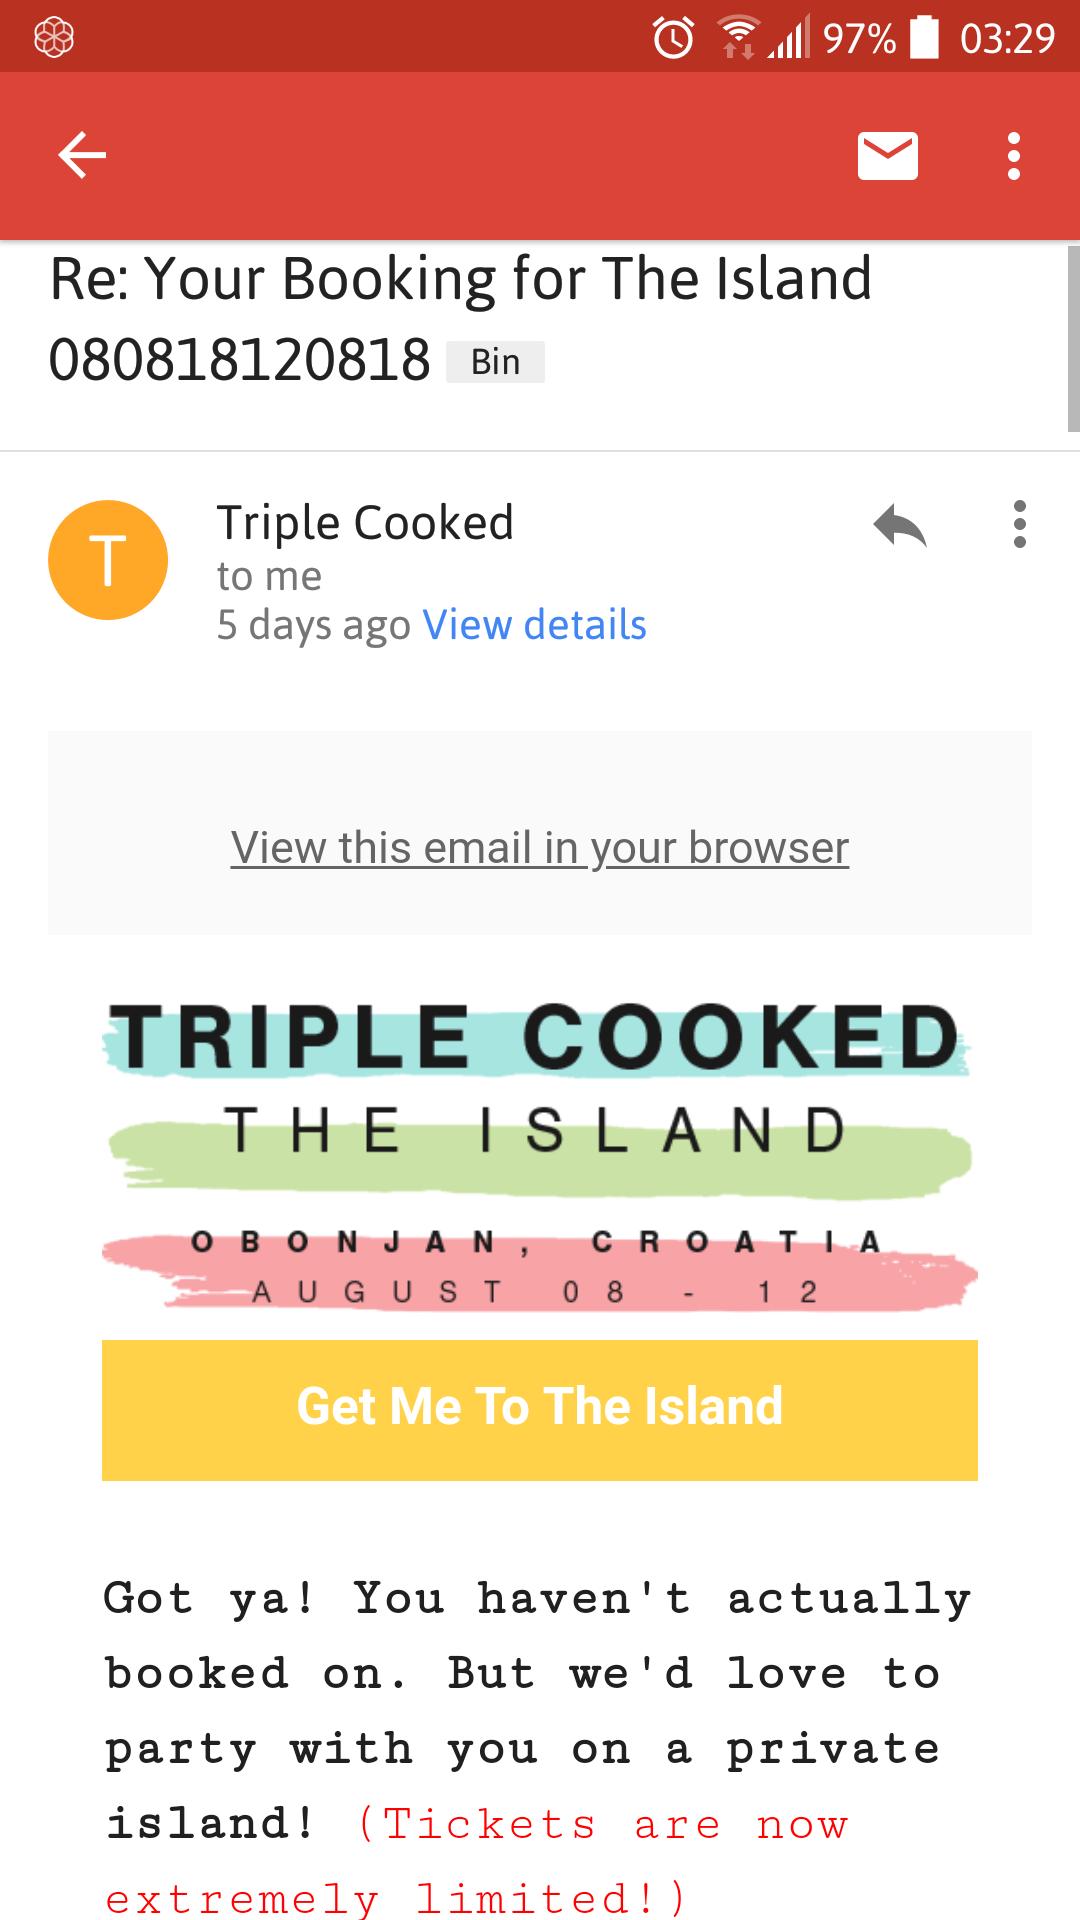 Clickbait en emailing